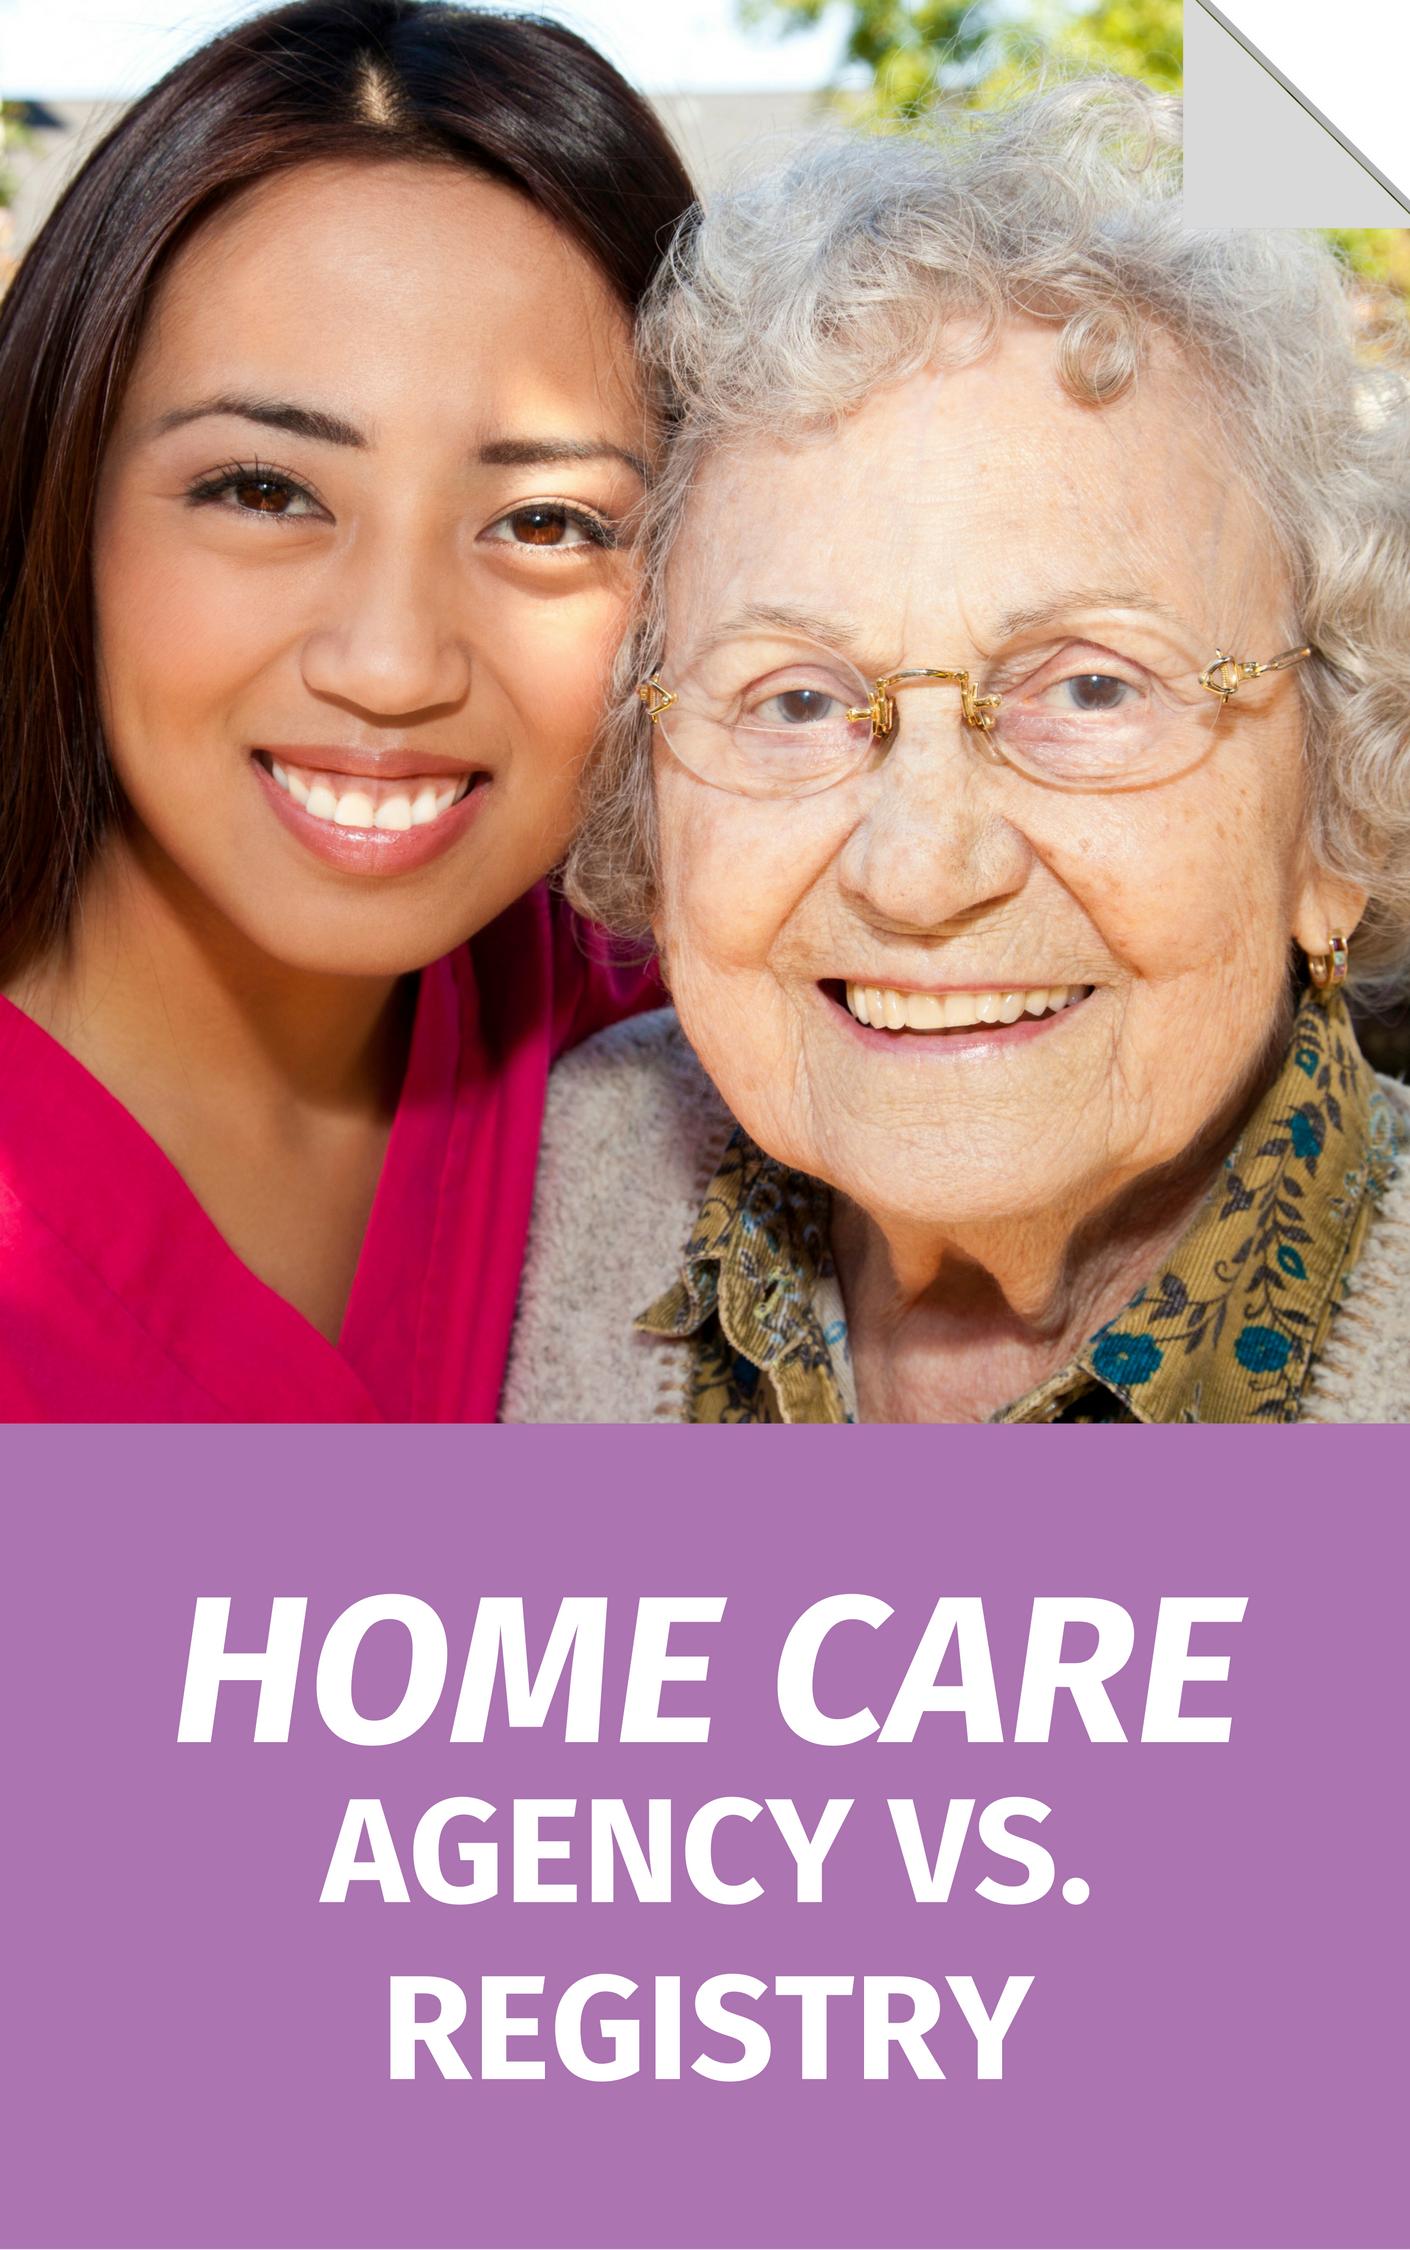 Home Care Agency vs. Registry